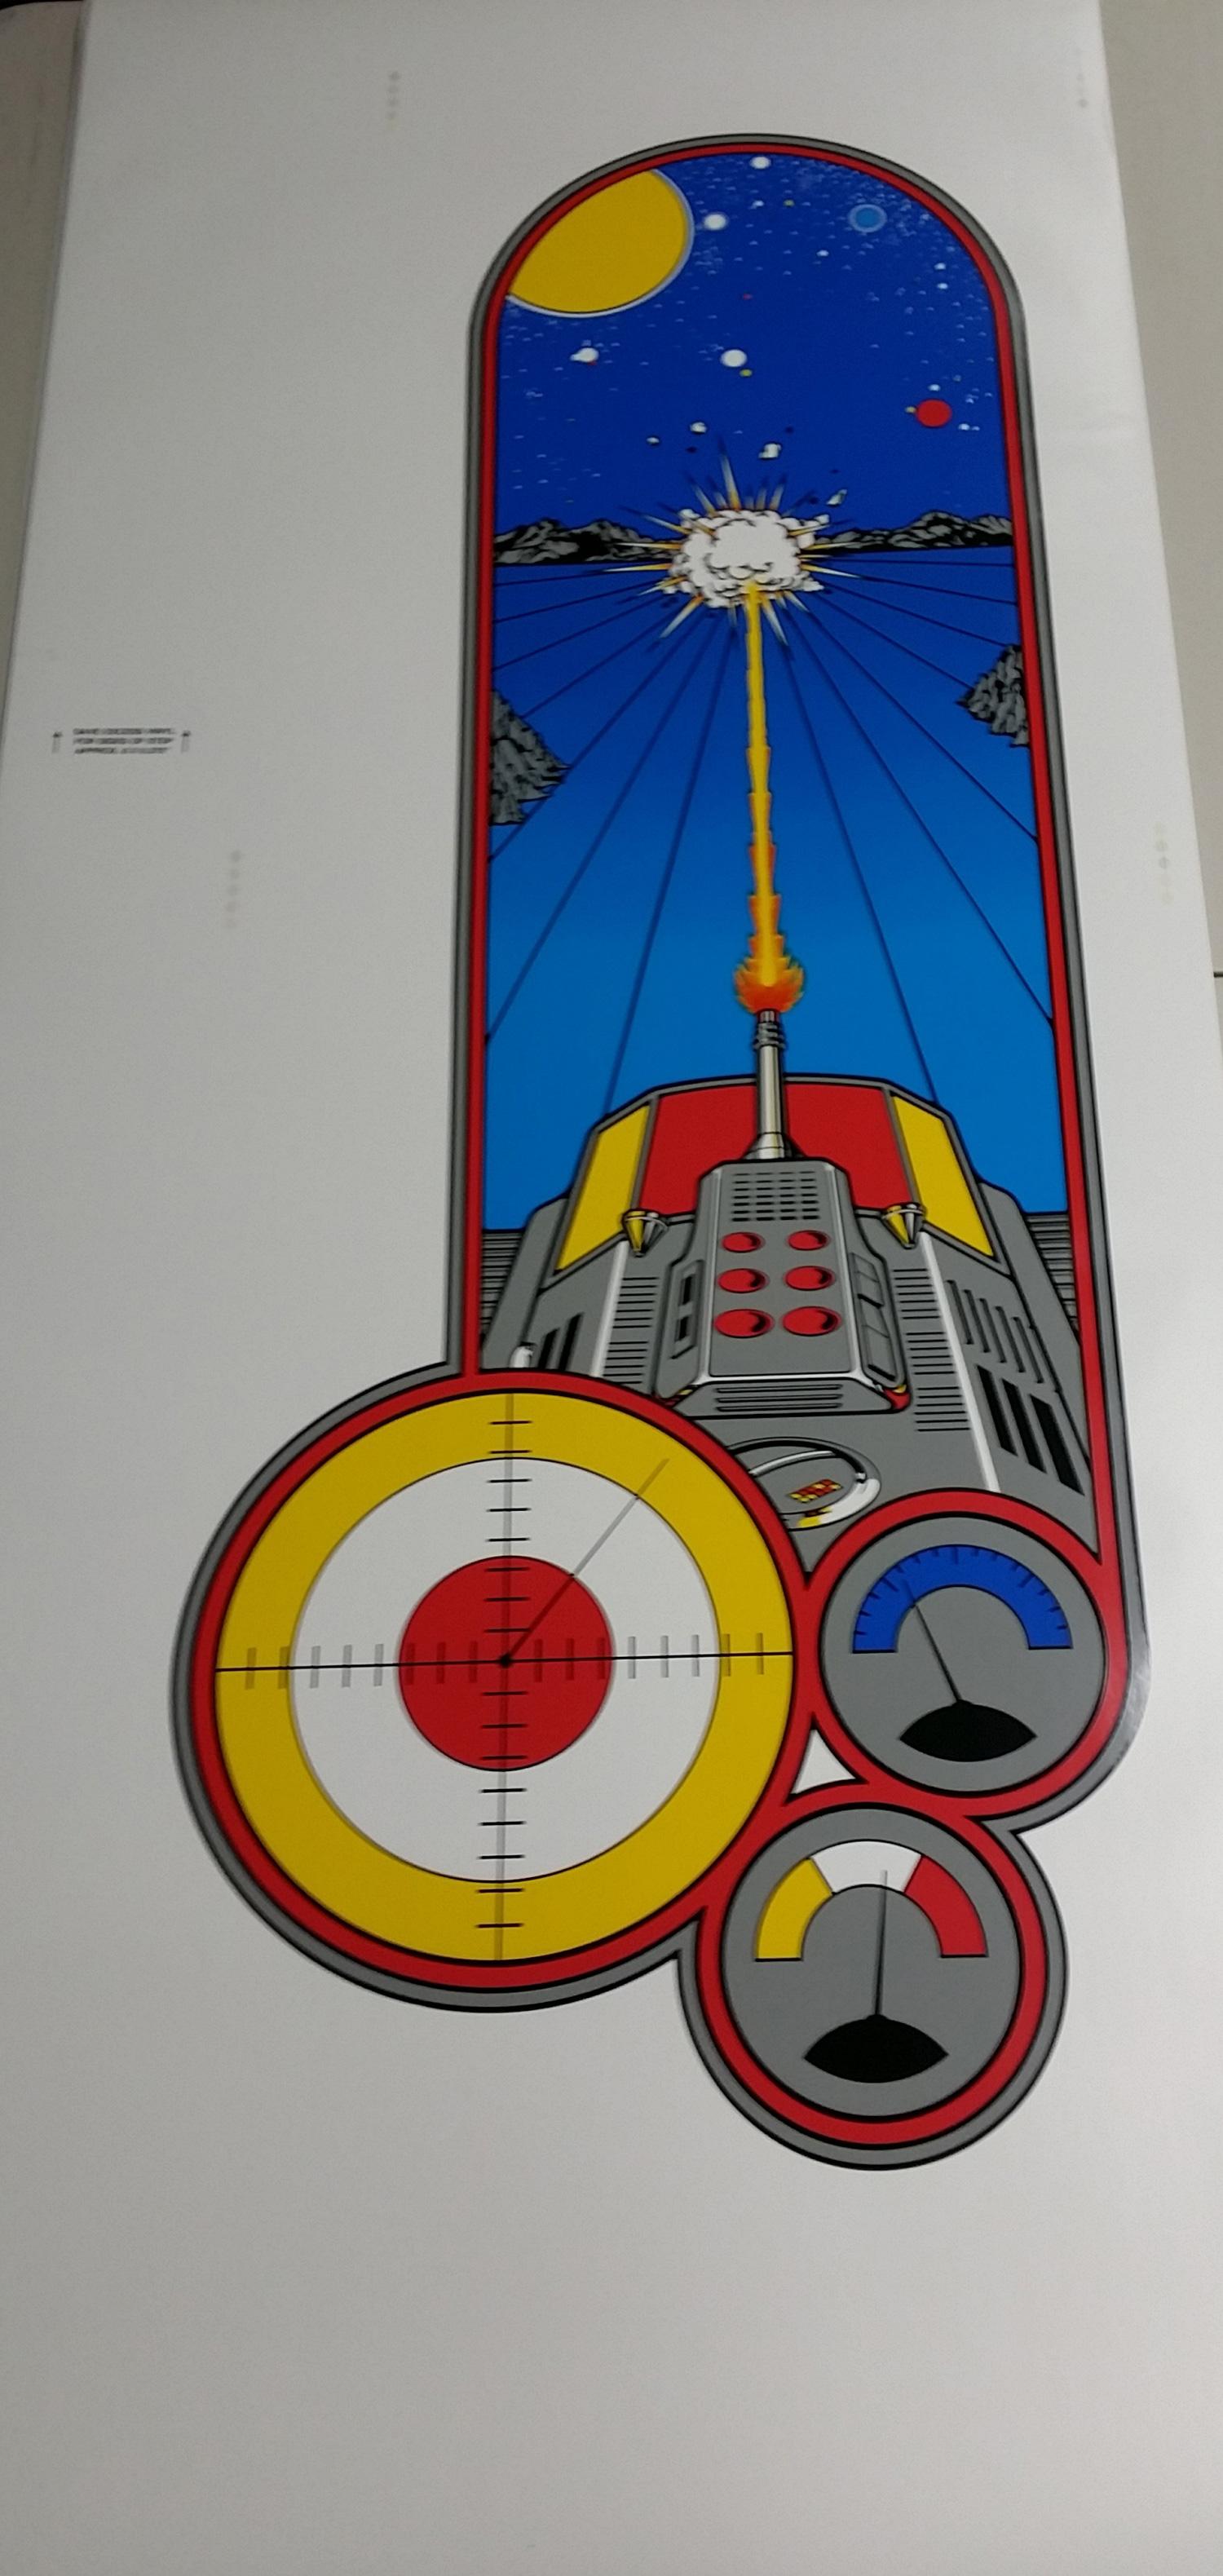 Battlezone Upright Side Art Phoenix Arcade 1 Source